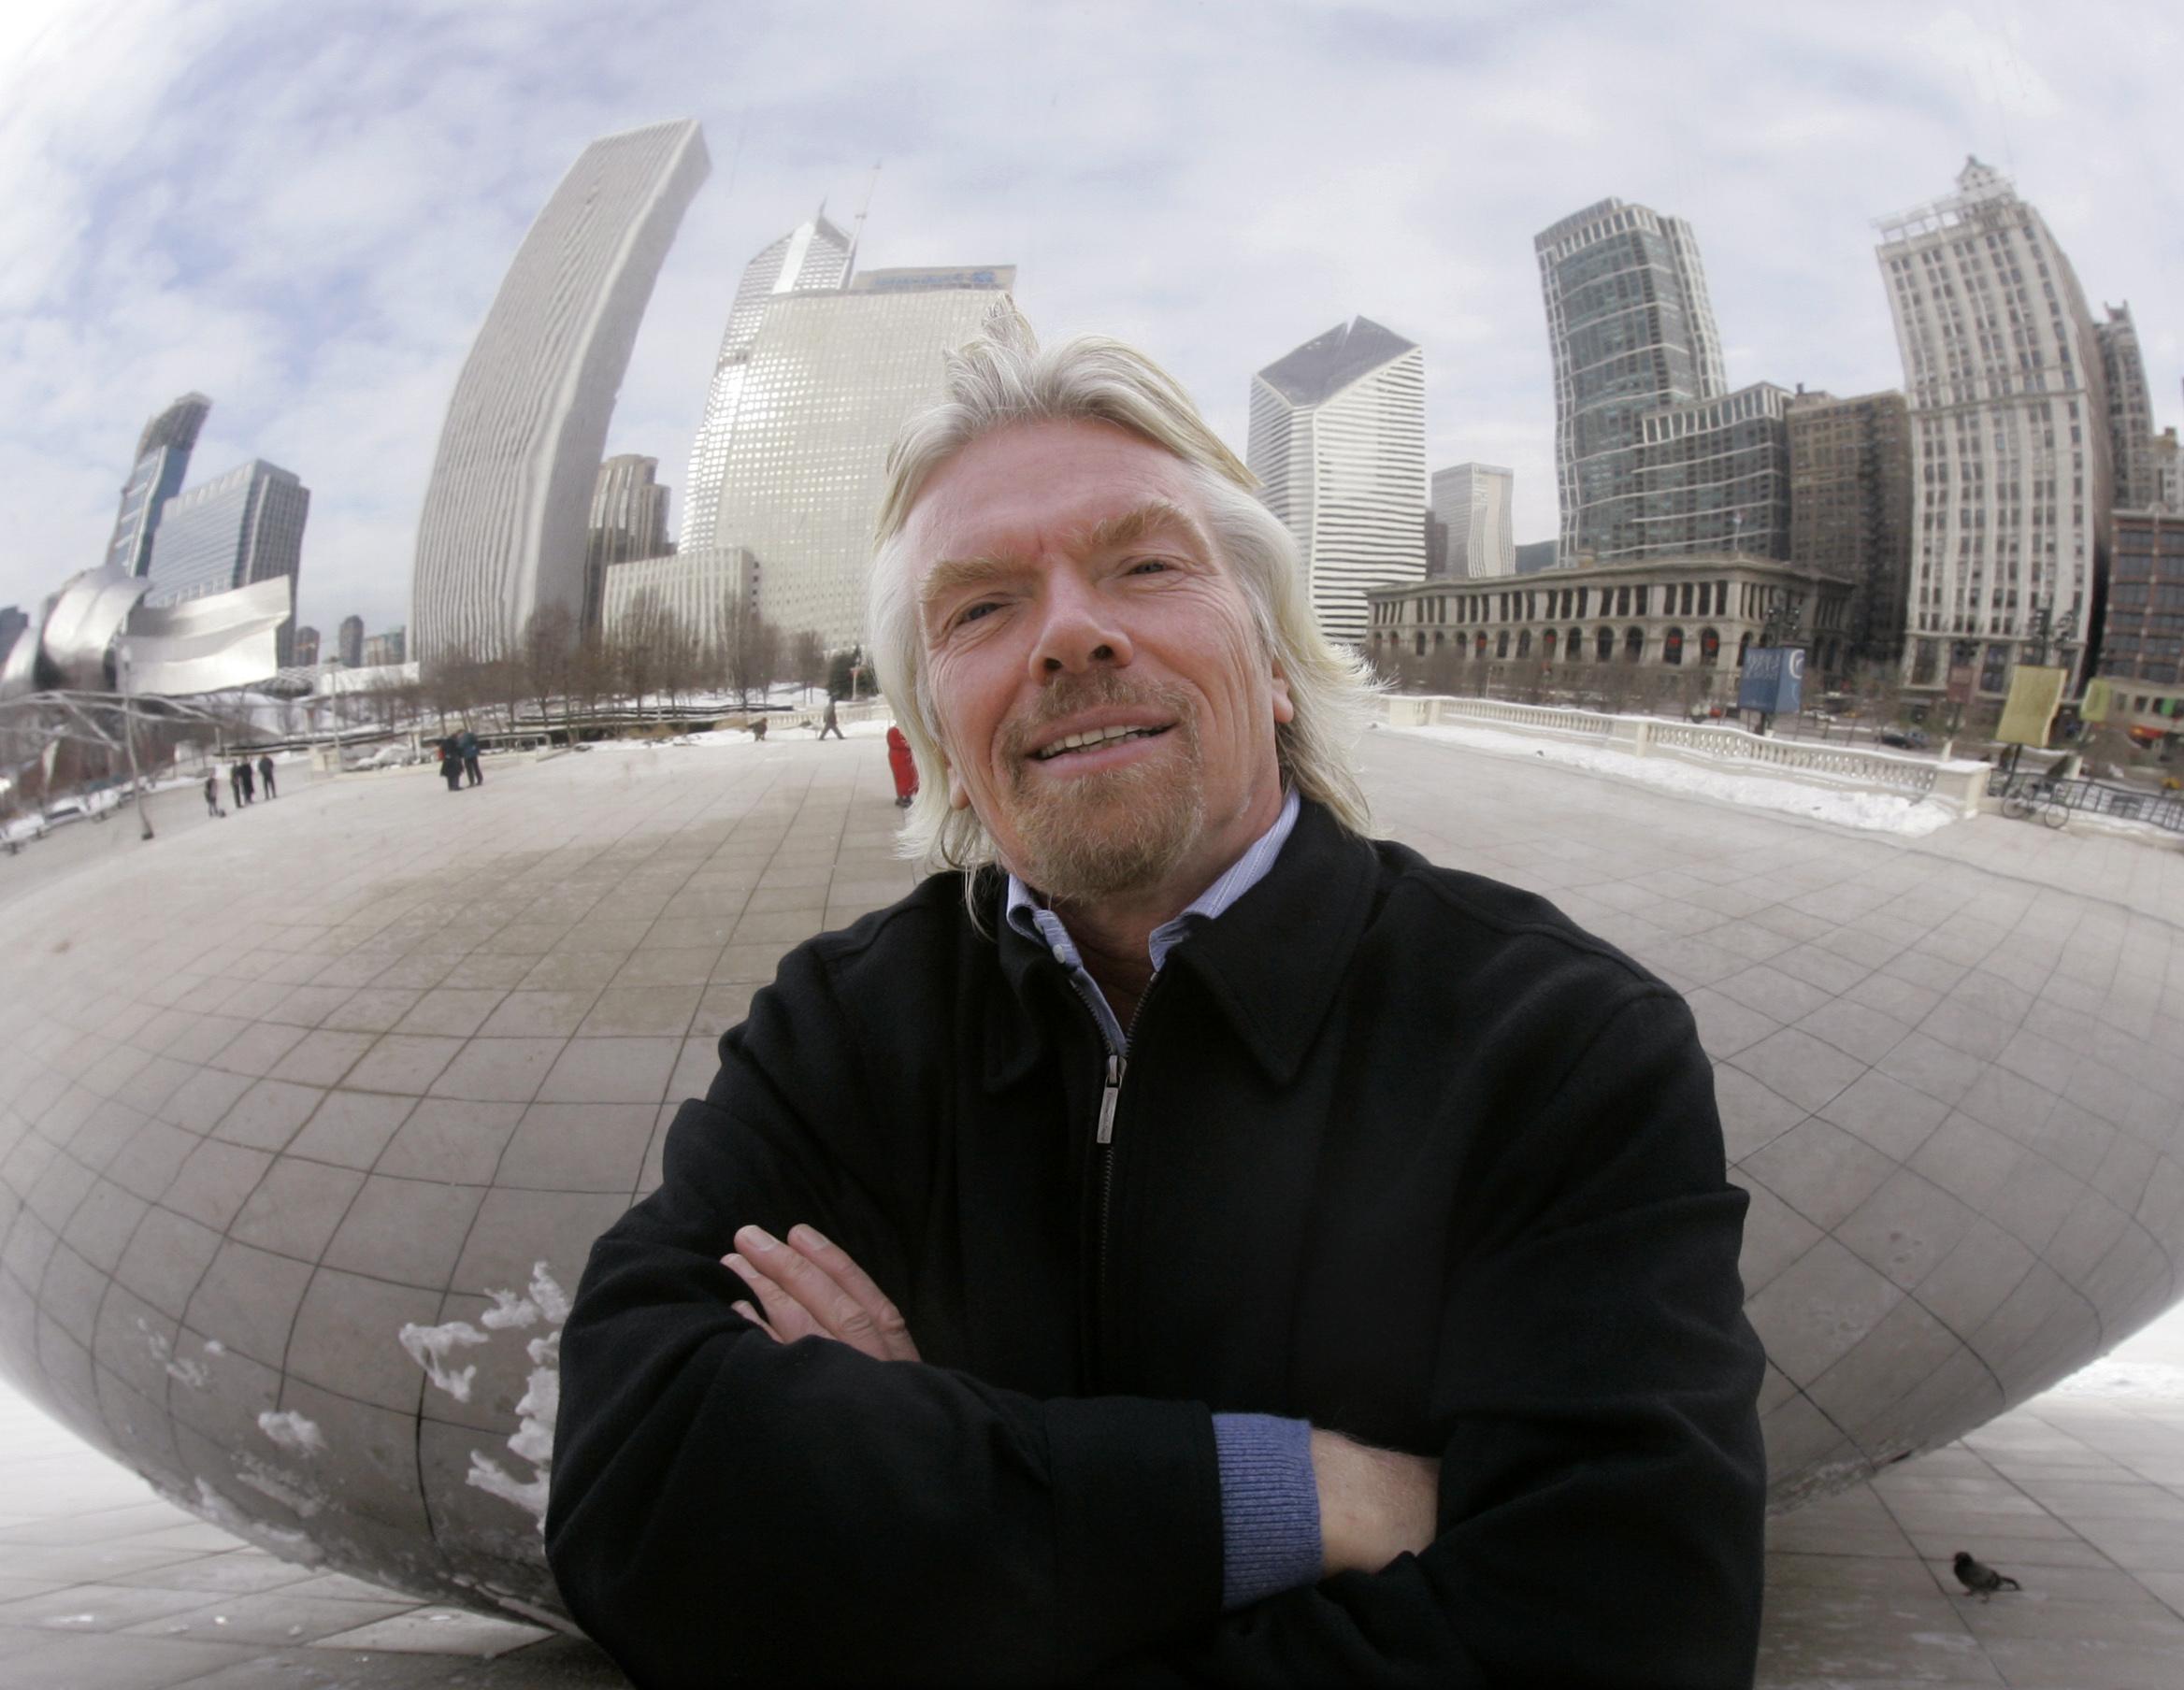 Branson bids on 600 Lloyds branches